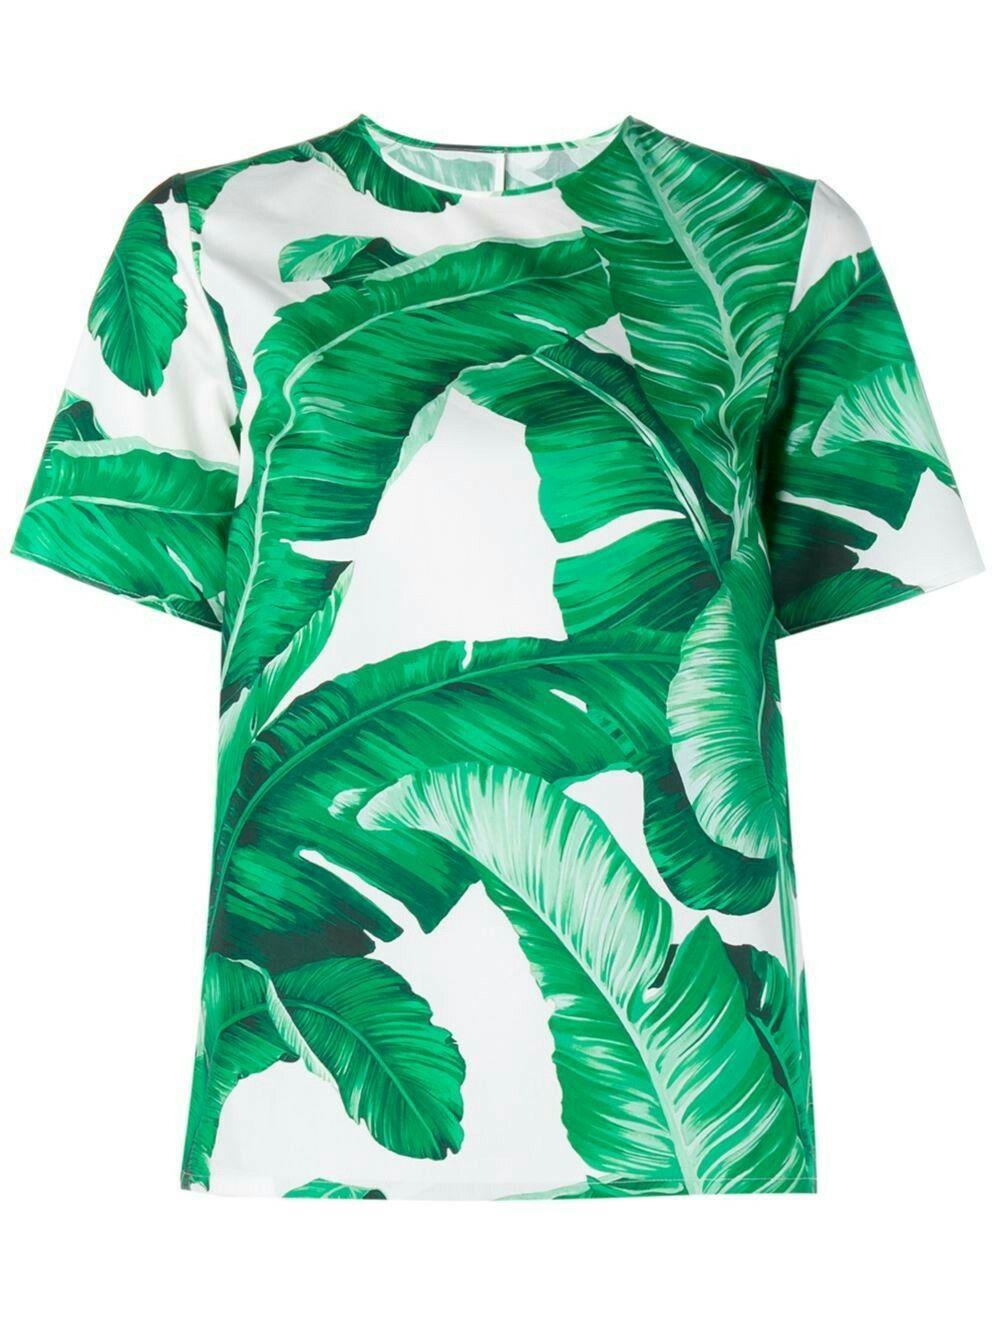 0dd032fab47cc3 Banana Leaf Print Short Sleeve Top